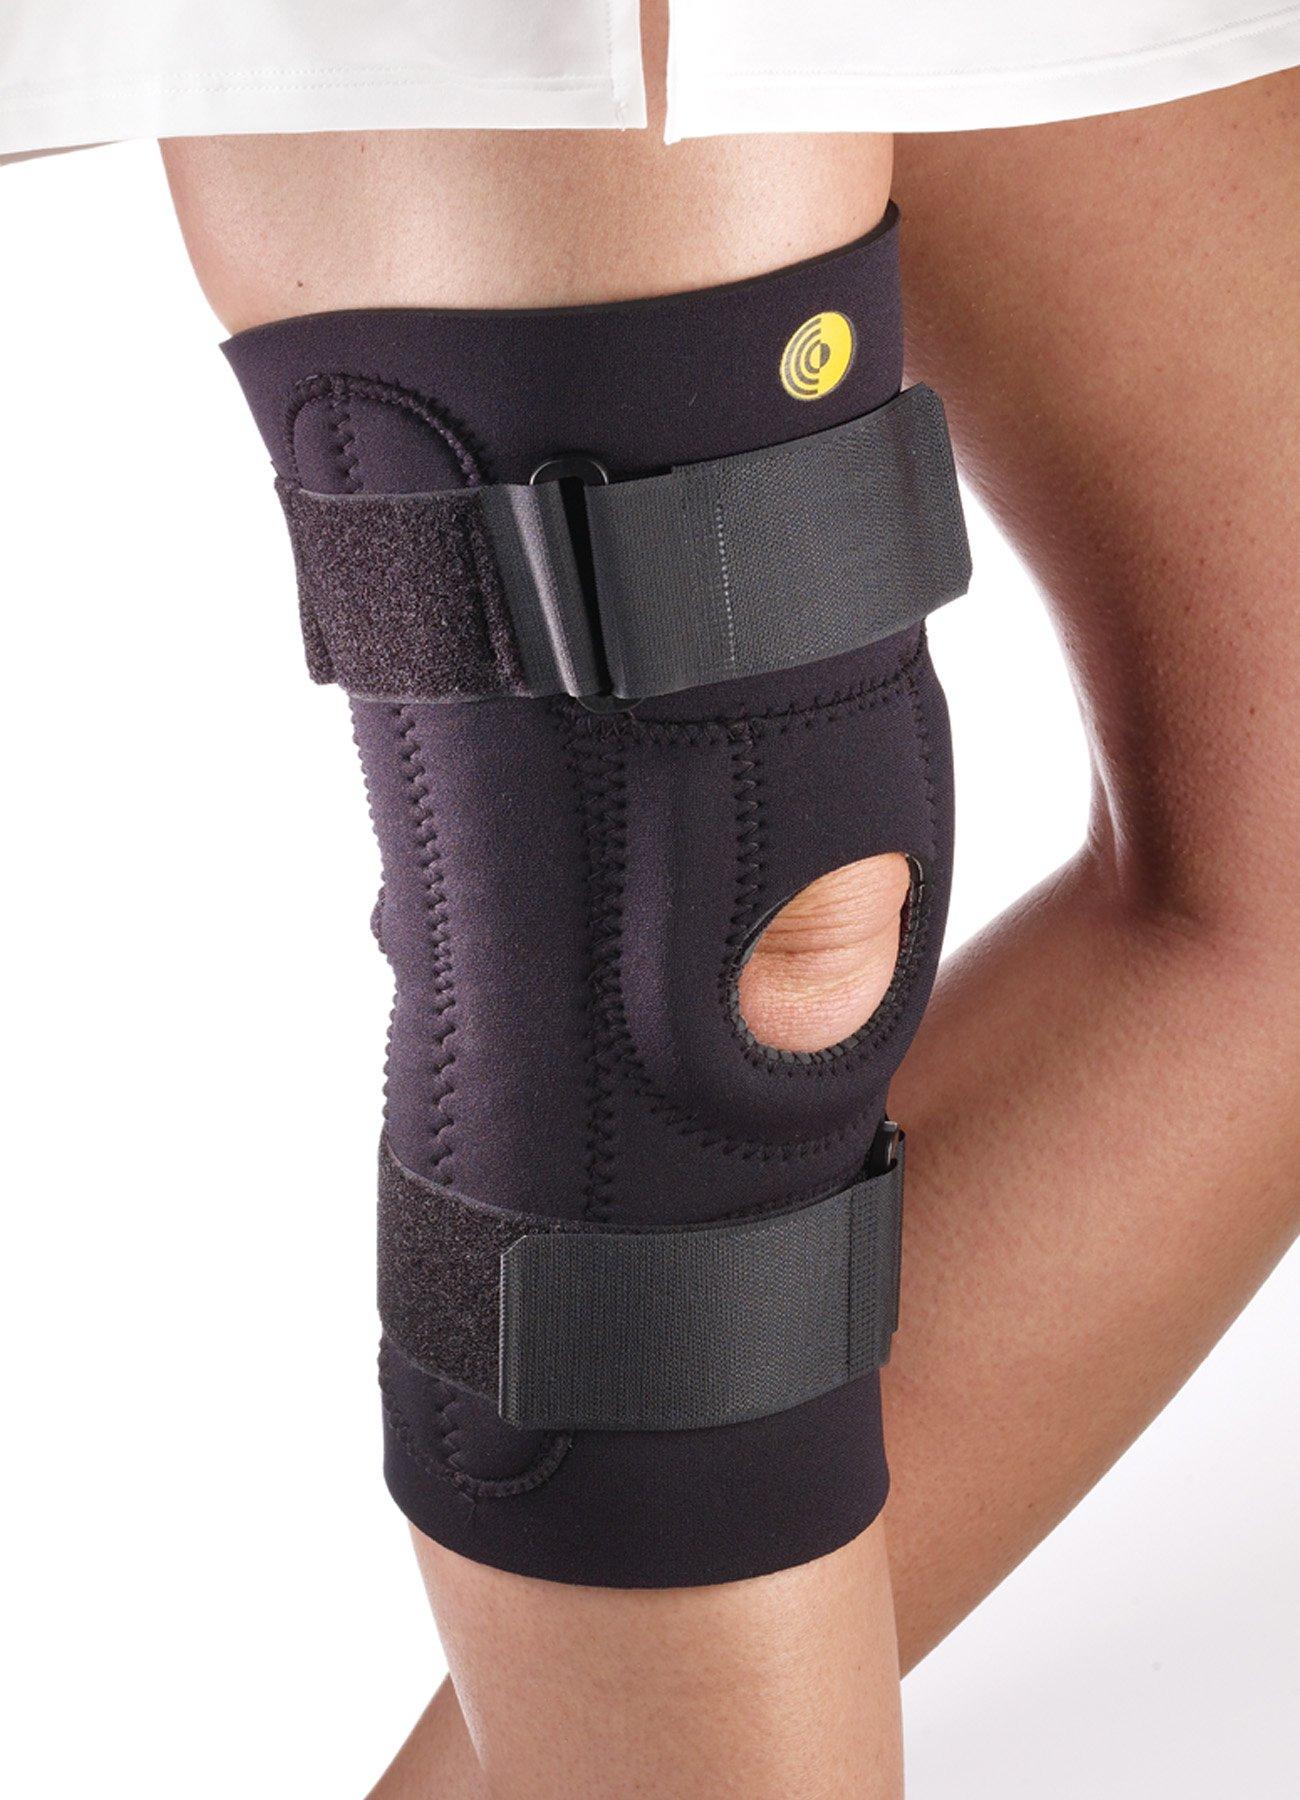 Corflex Contender Knee Brace 13'' R.O.M. Hinge X-LARGE by Corflex